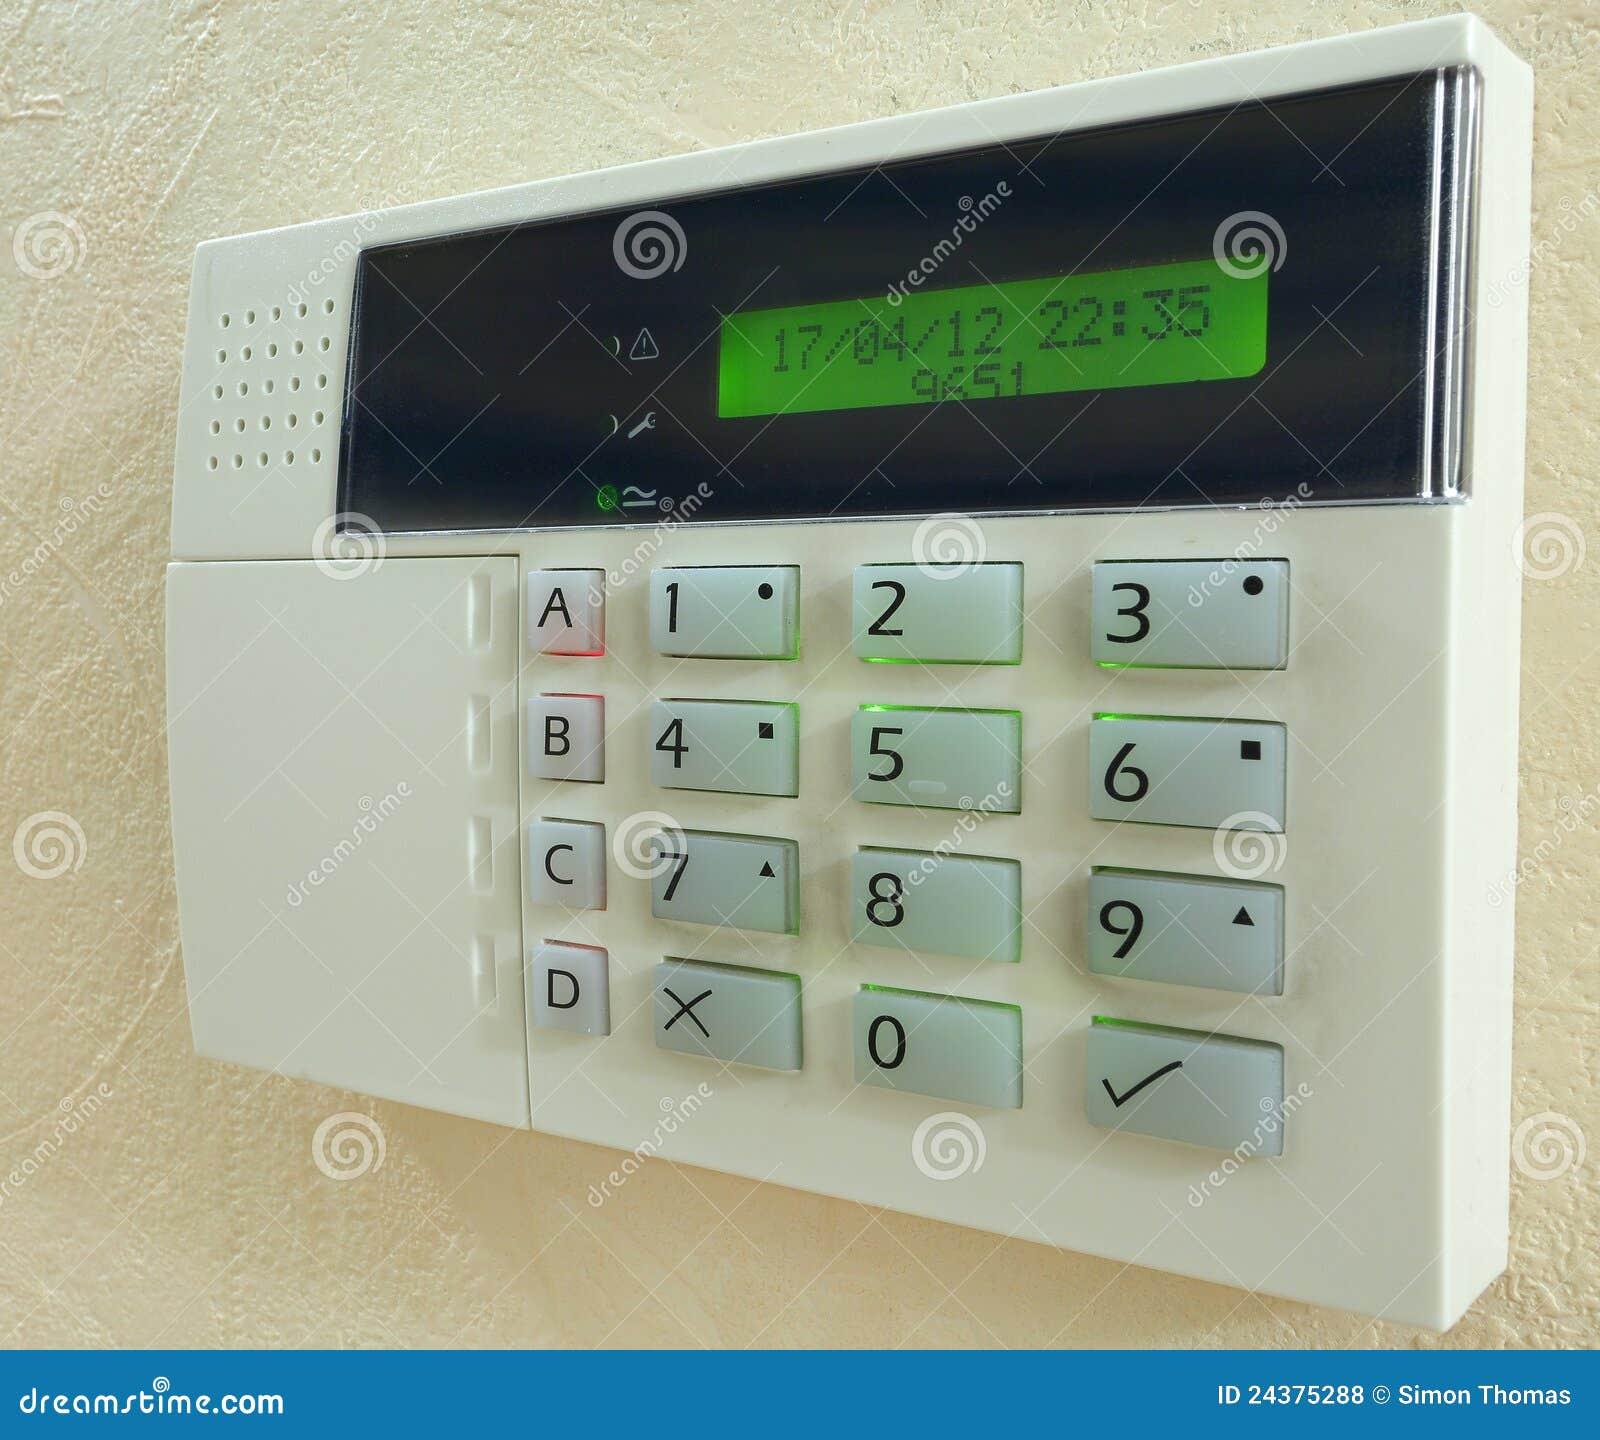 Alarm Panel Royalty Free Stock Photos Image 24375288